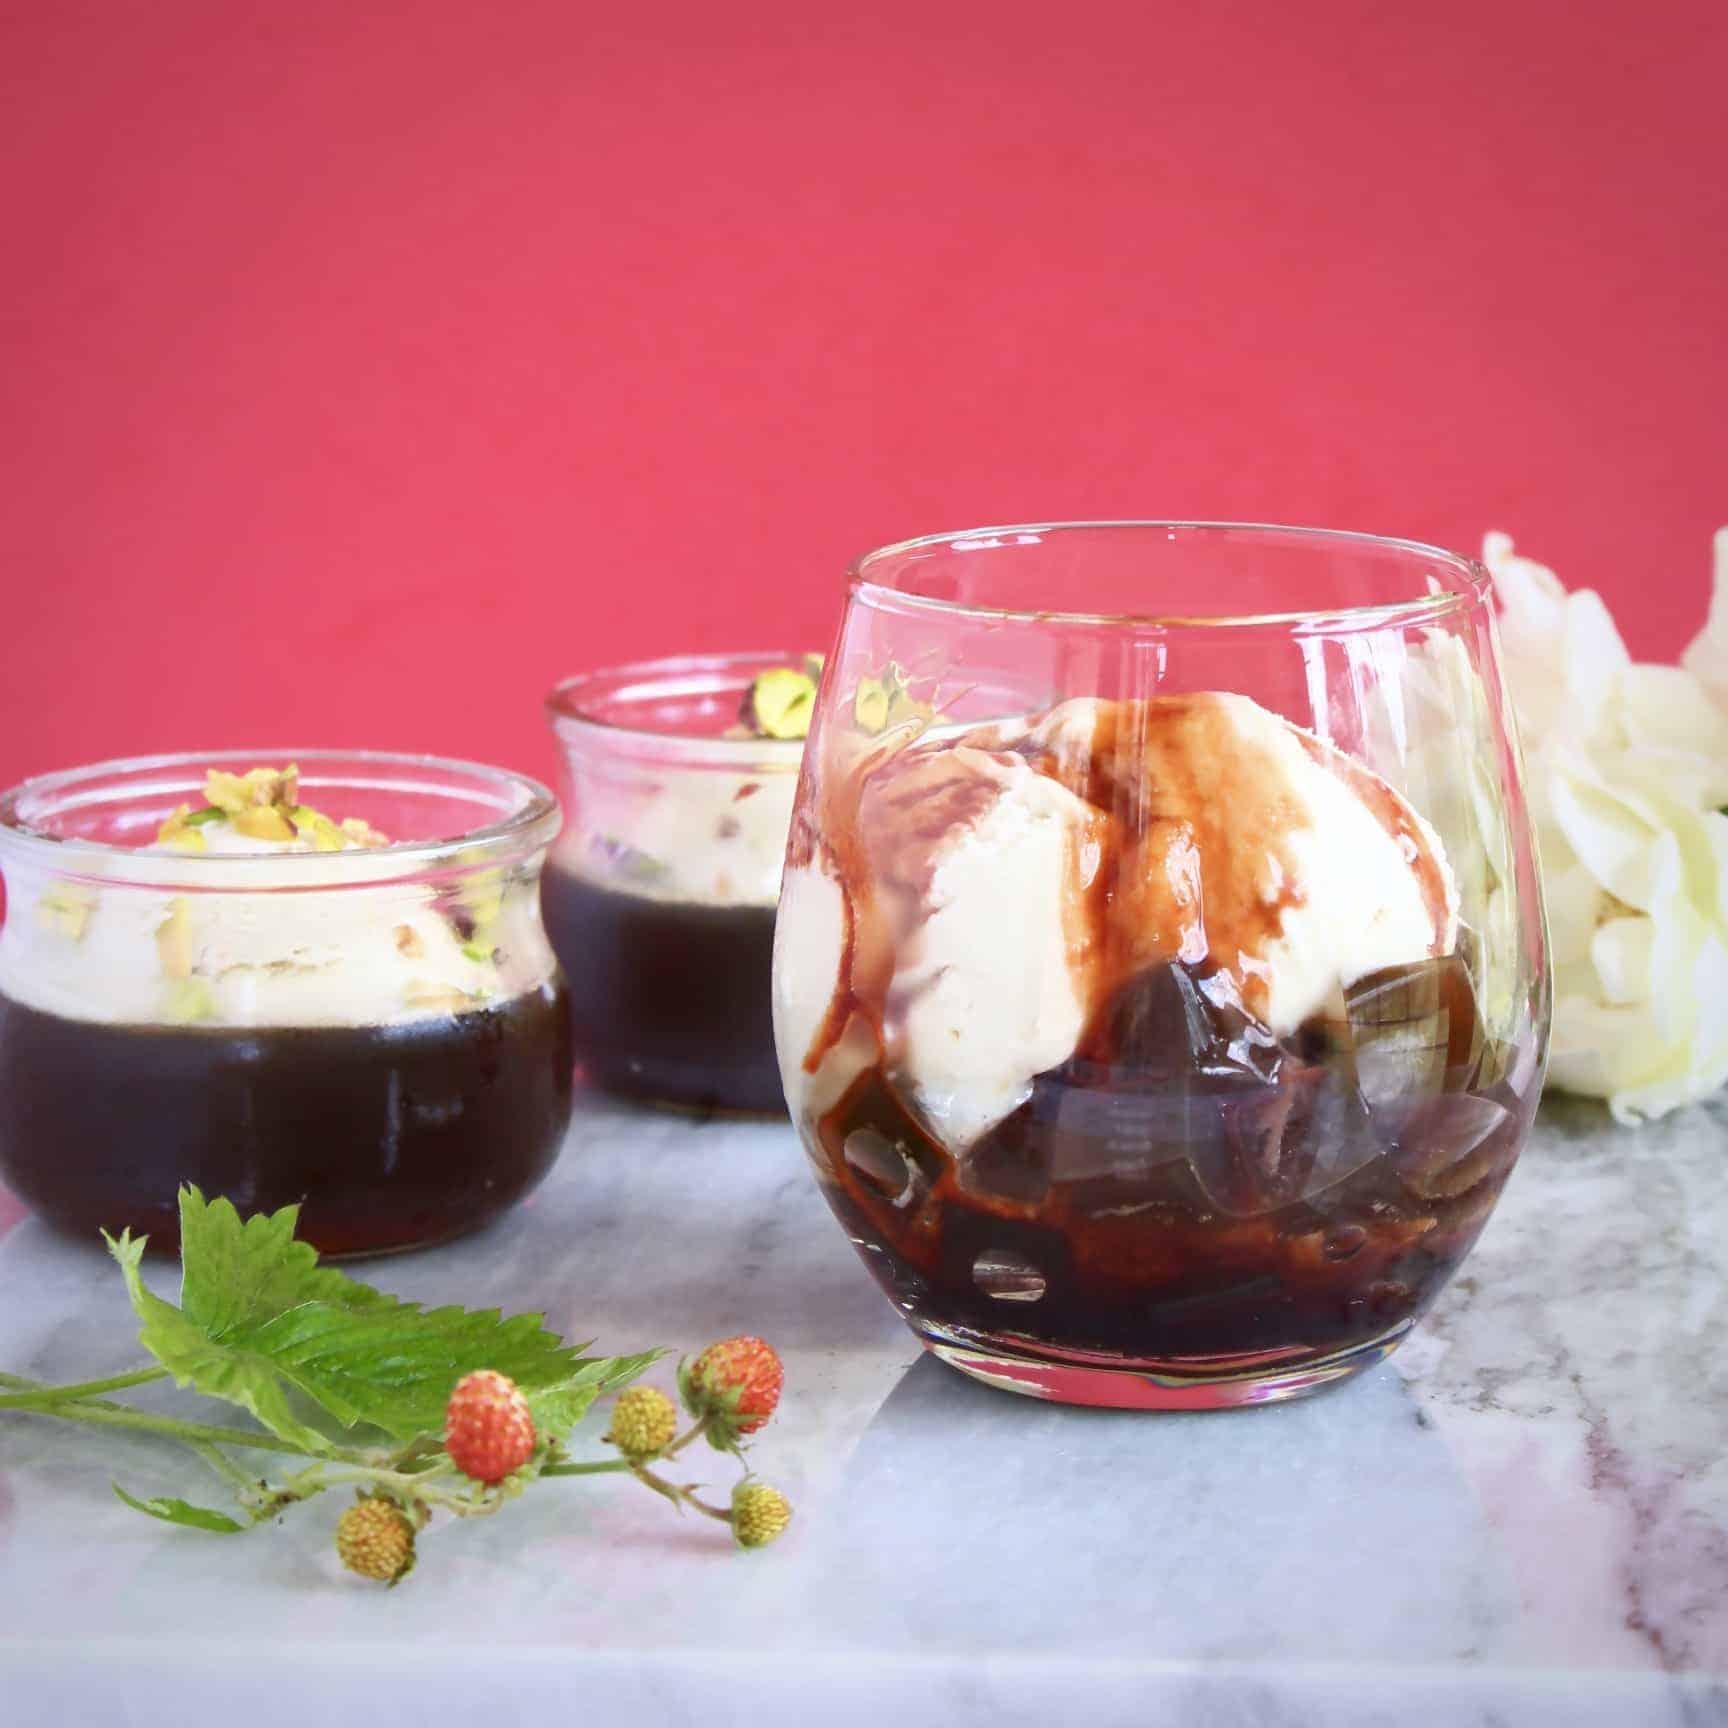 Coffee Jelly Ice Cream Sundae (Vegan + GF)